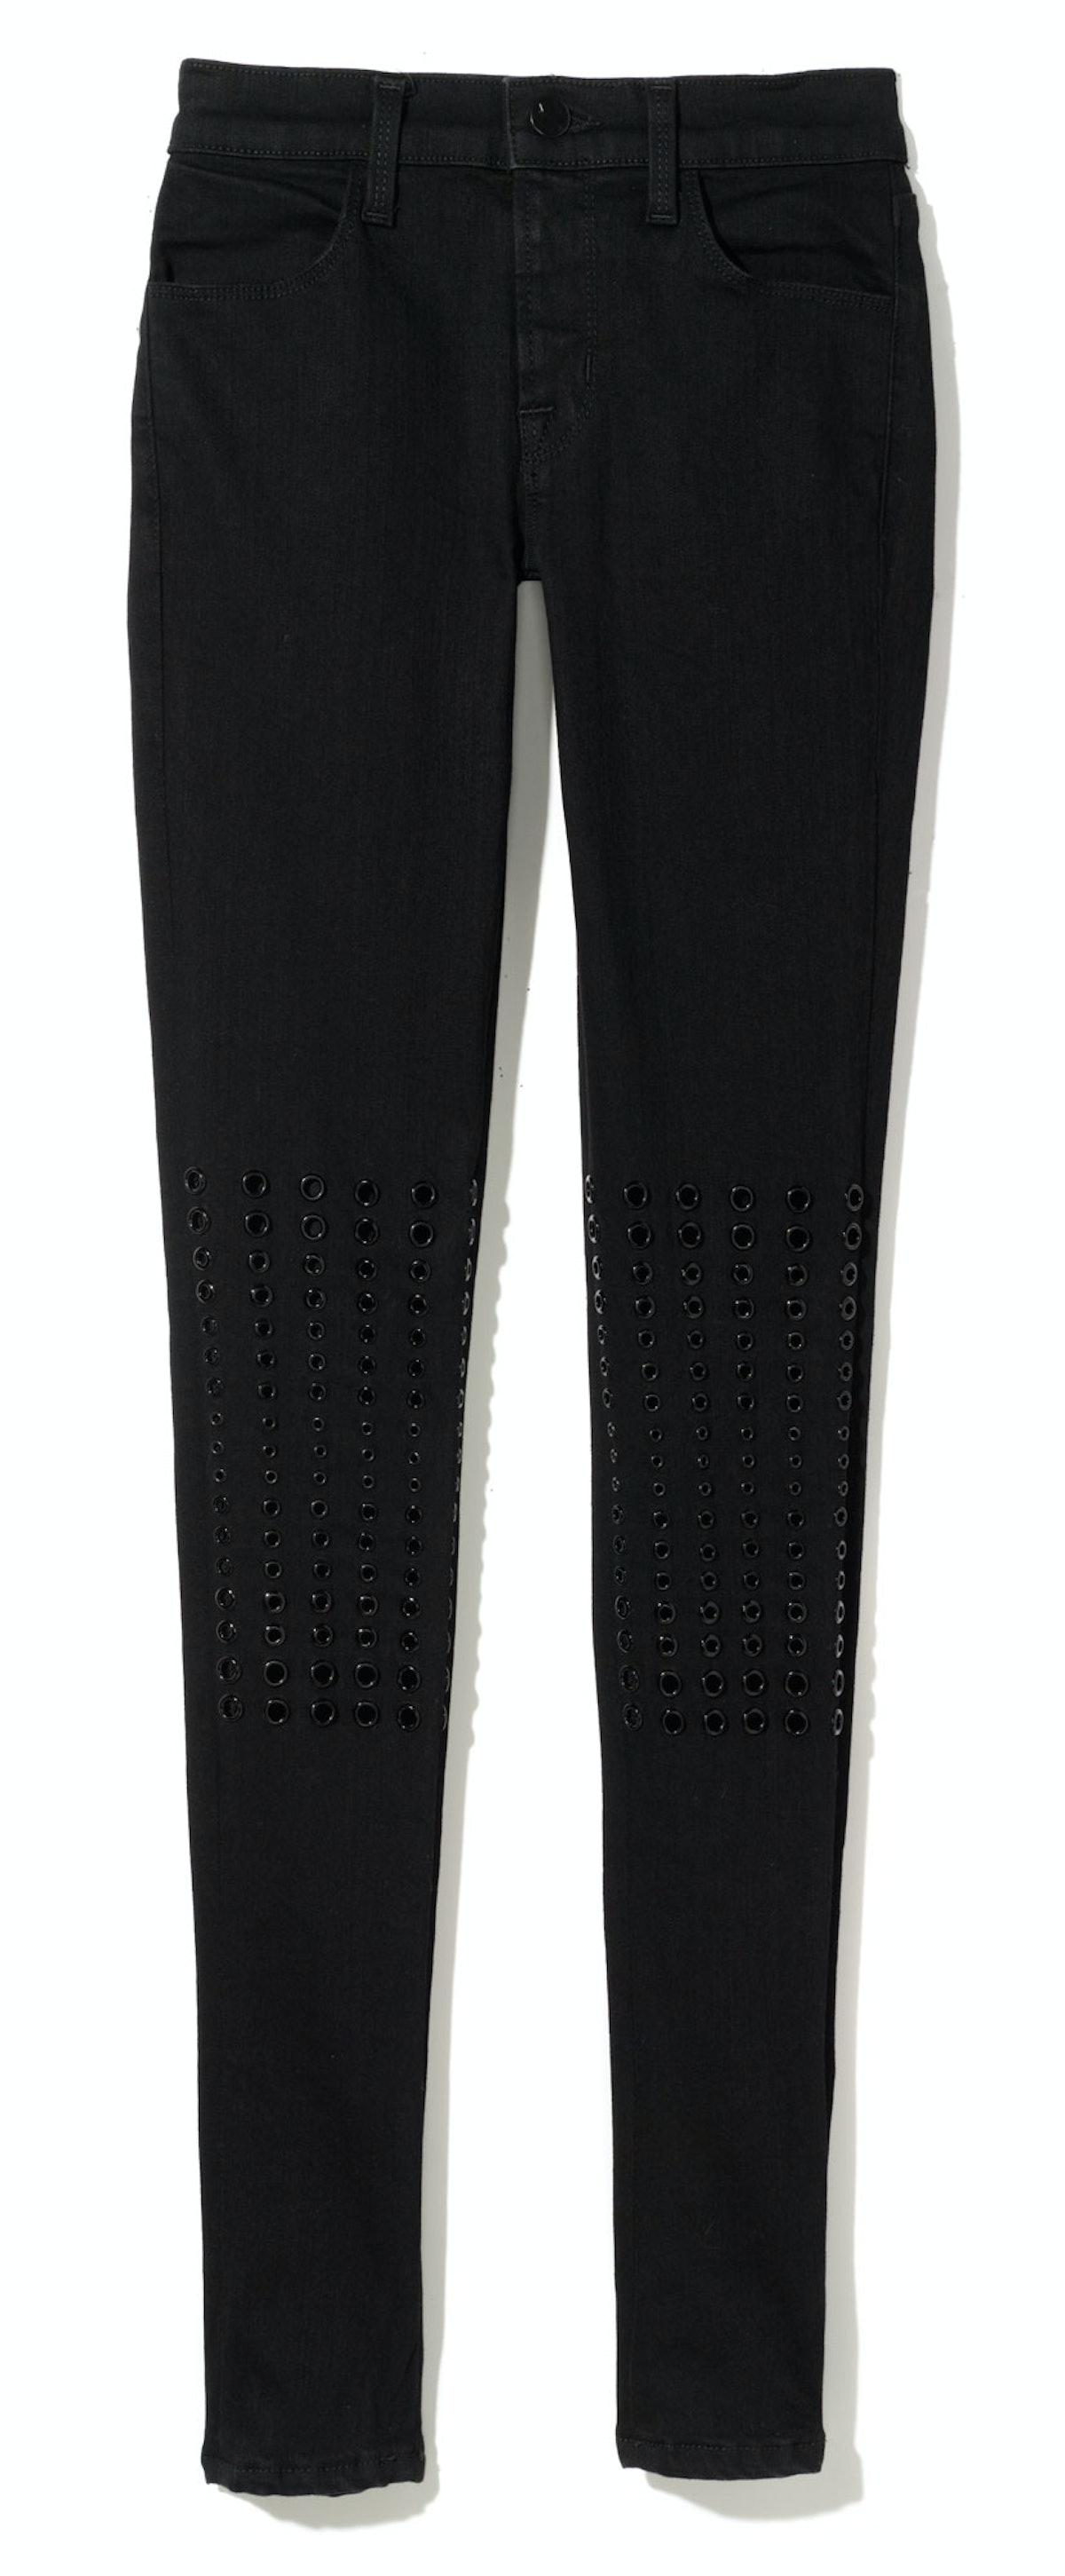 J Brand jeans, $354, [jbrand.com](http://rstyle.me/n/djxec3w3n).